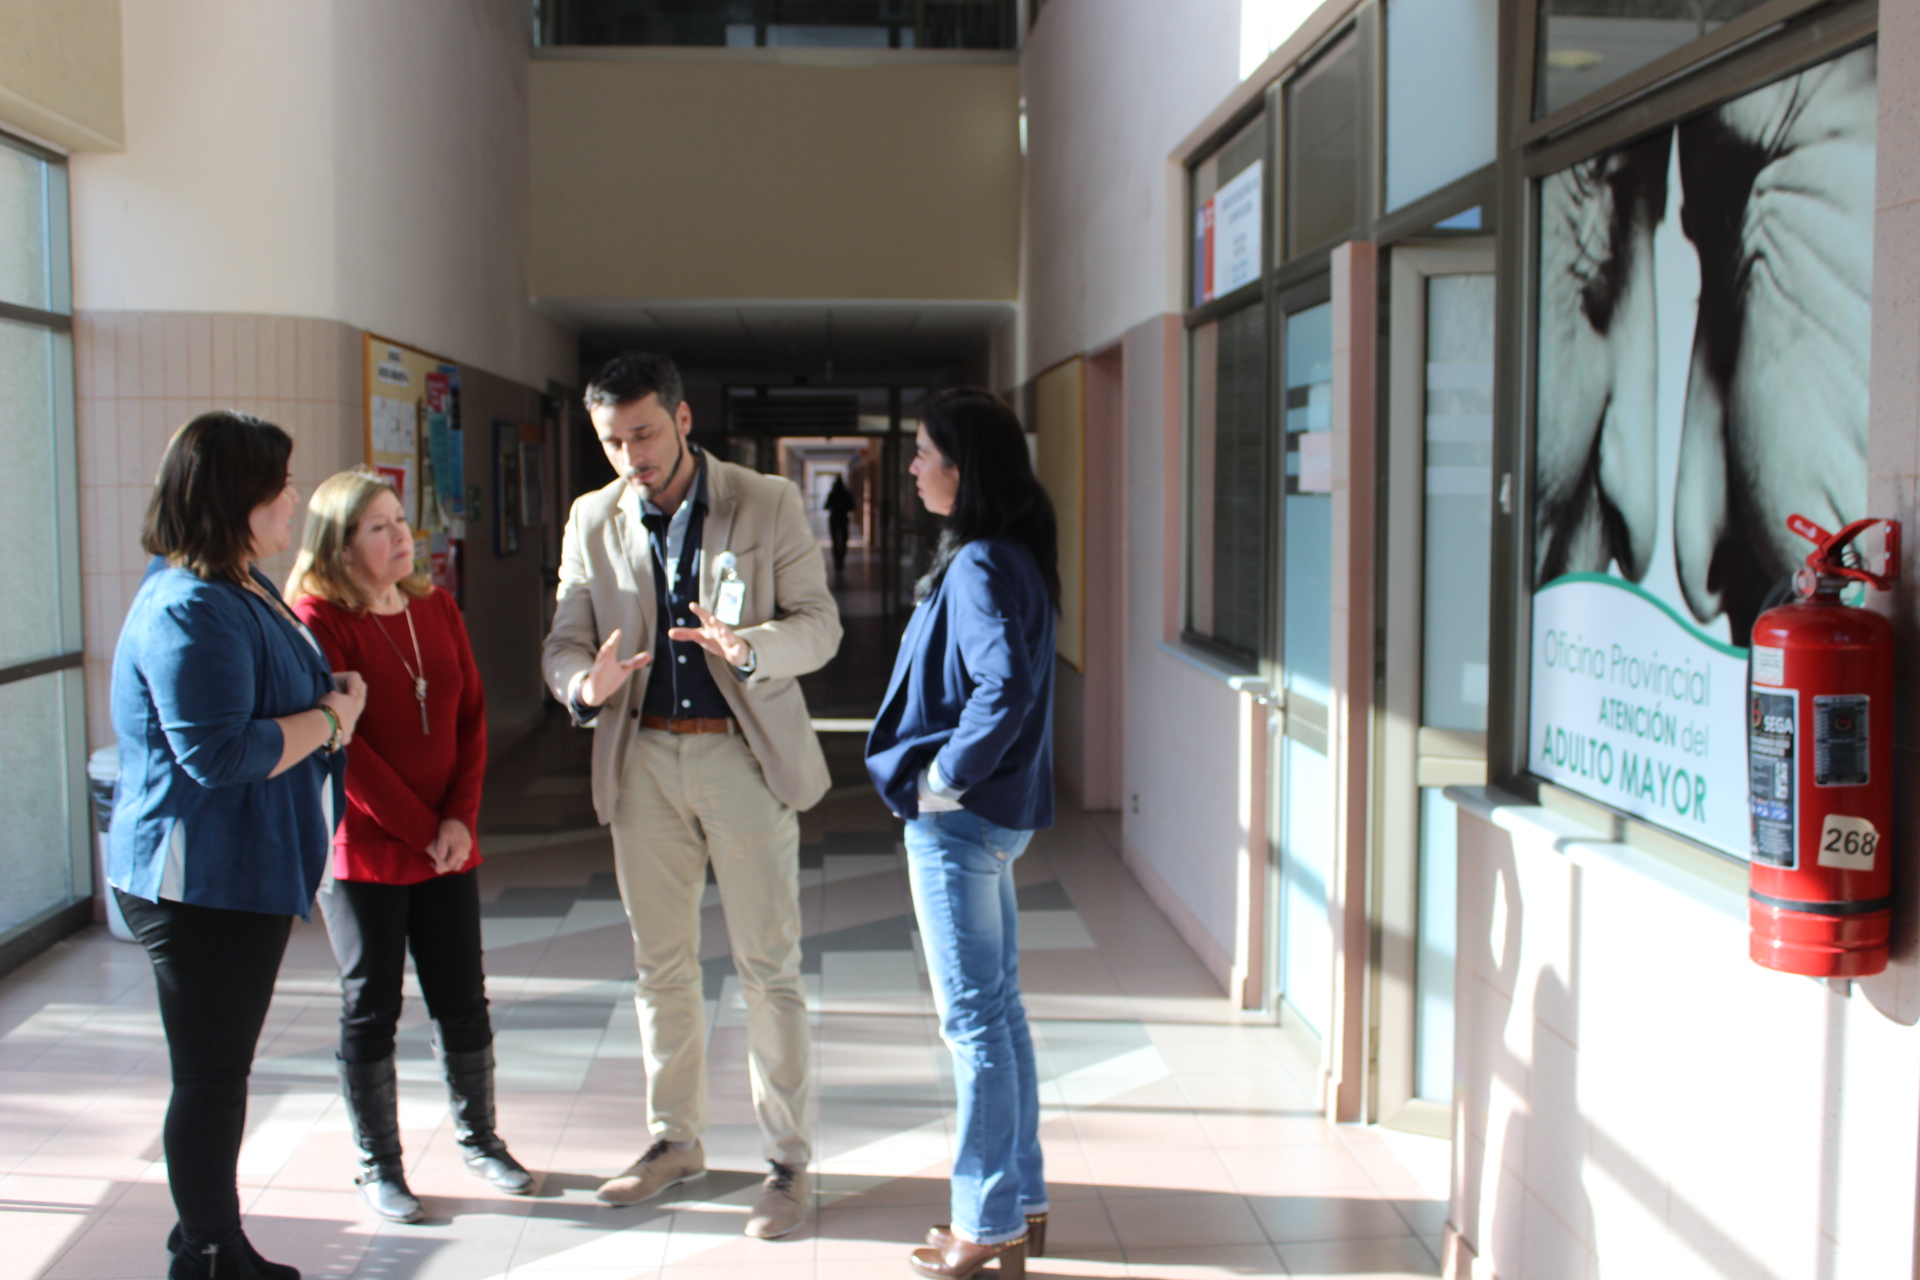 Directoras de PRODEMU comprometen alianza estratégica con Hospital Provincial del Huasco